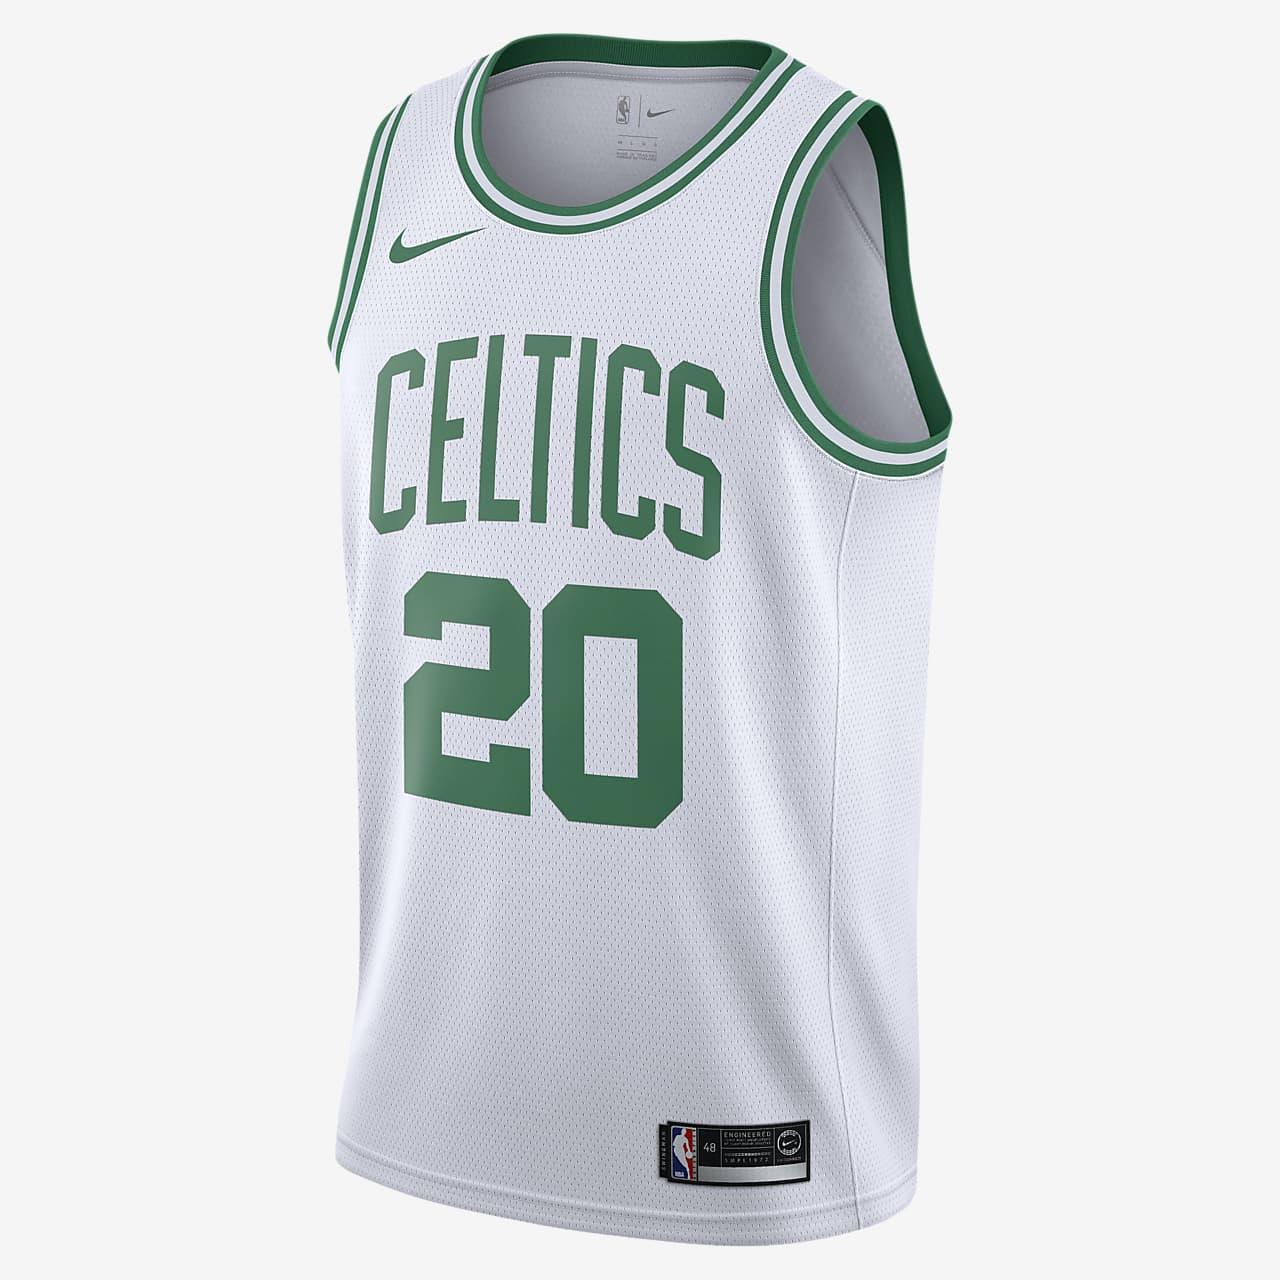 Gordon Hayward Celtics Association Edition Nike NBA Swingman Jersey